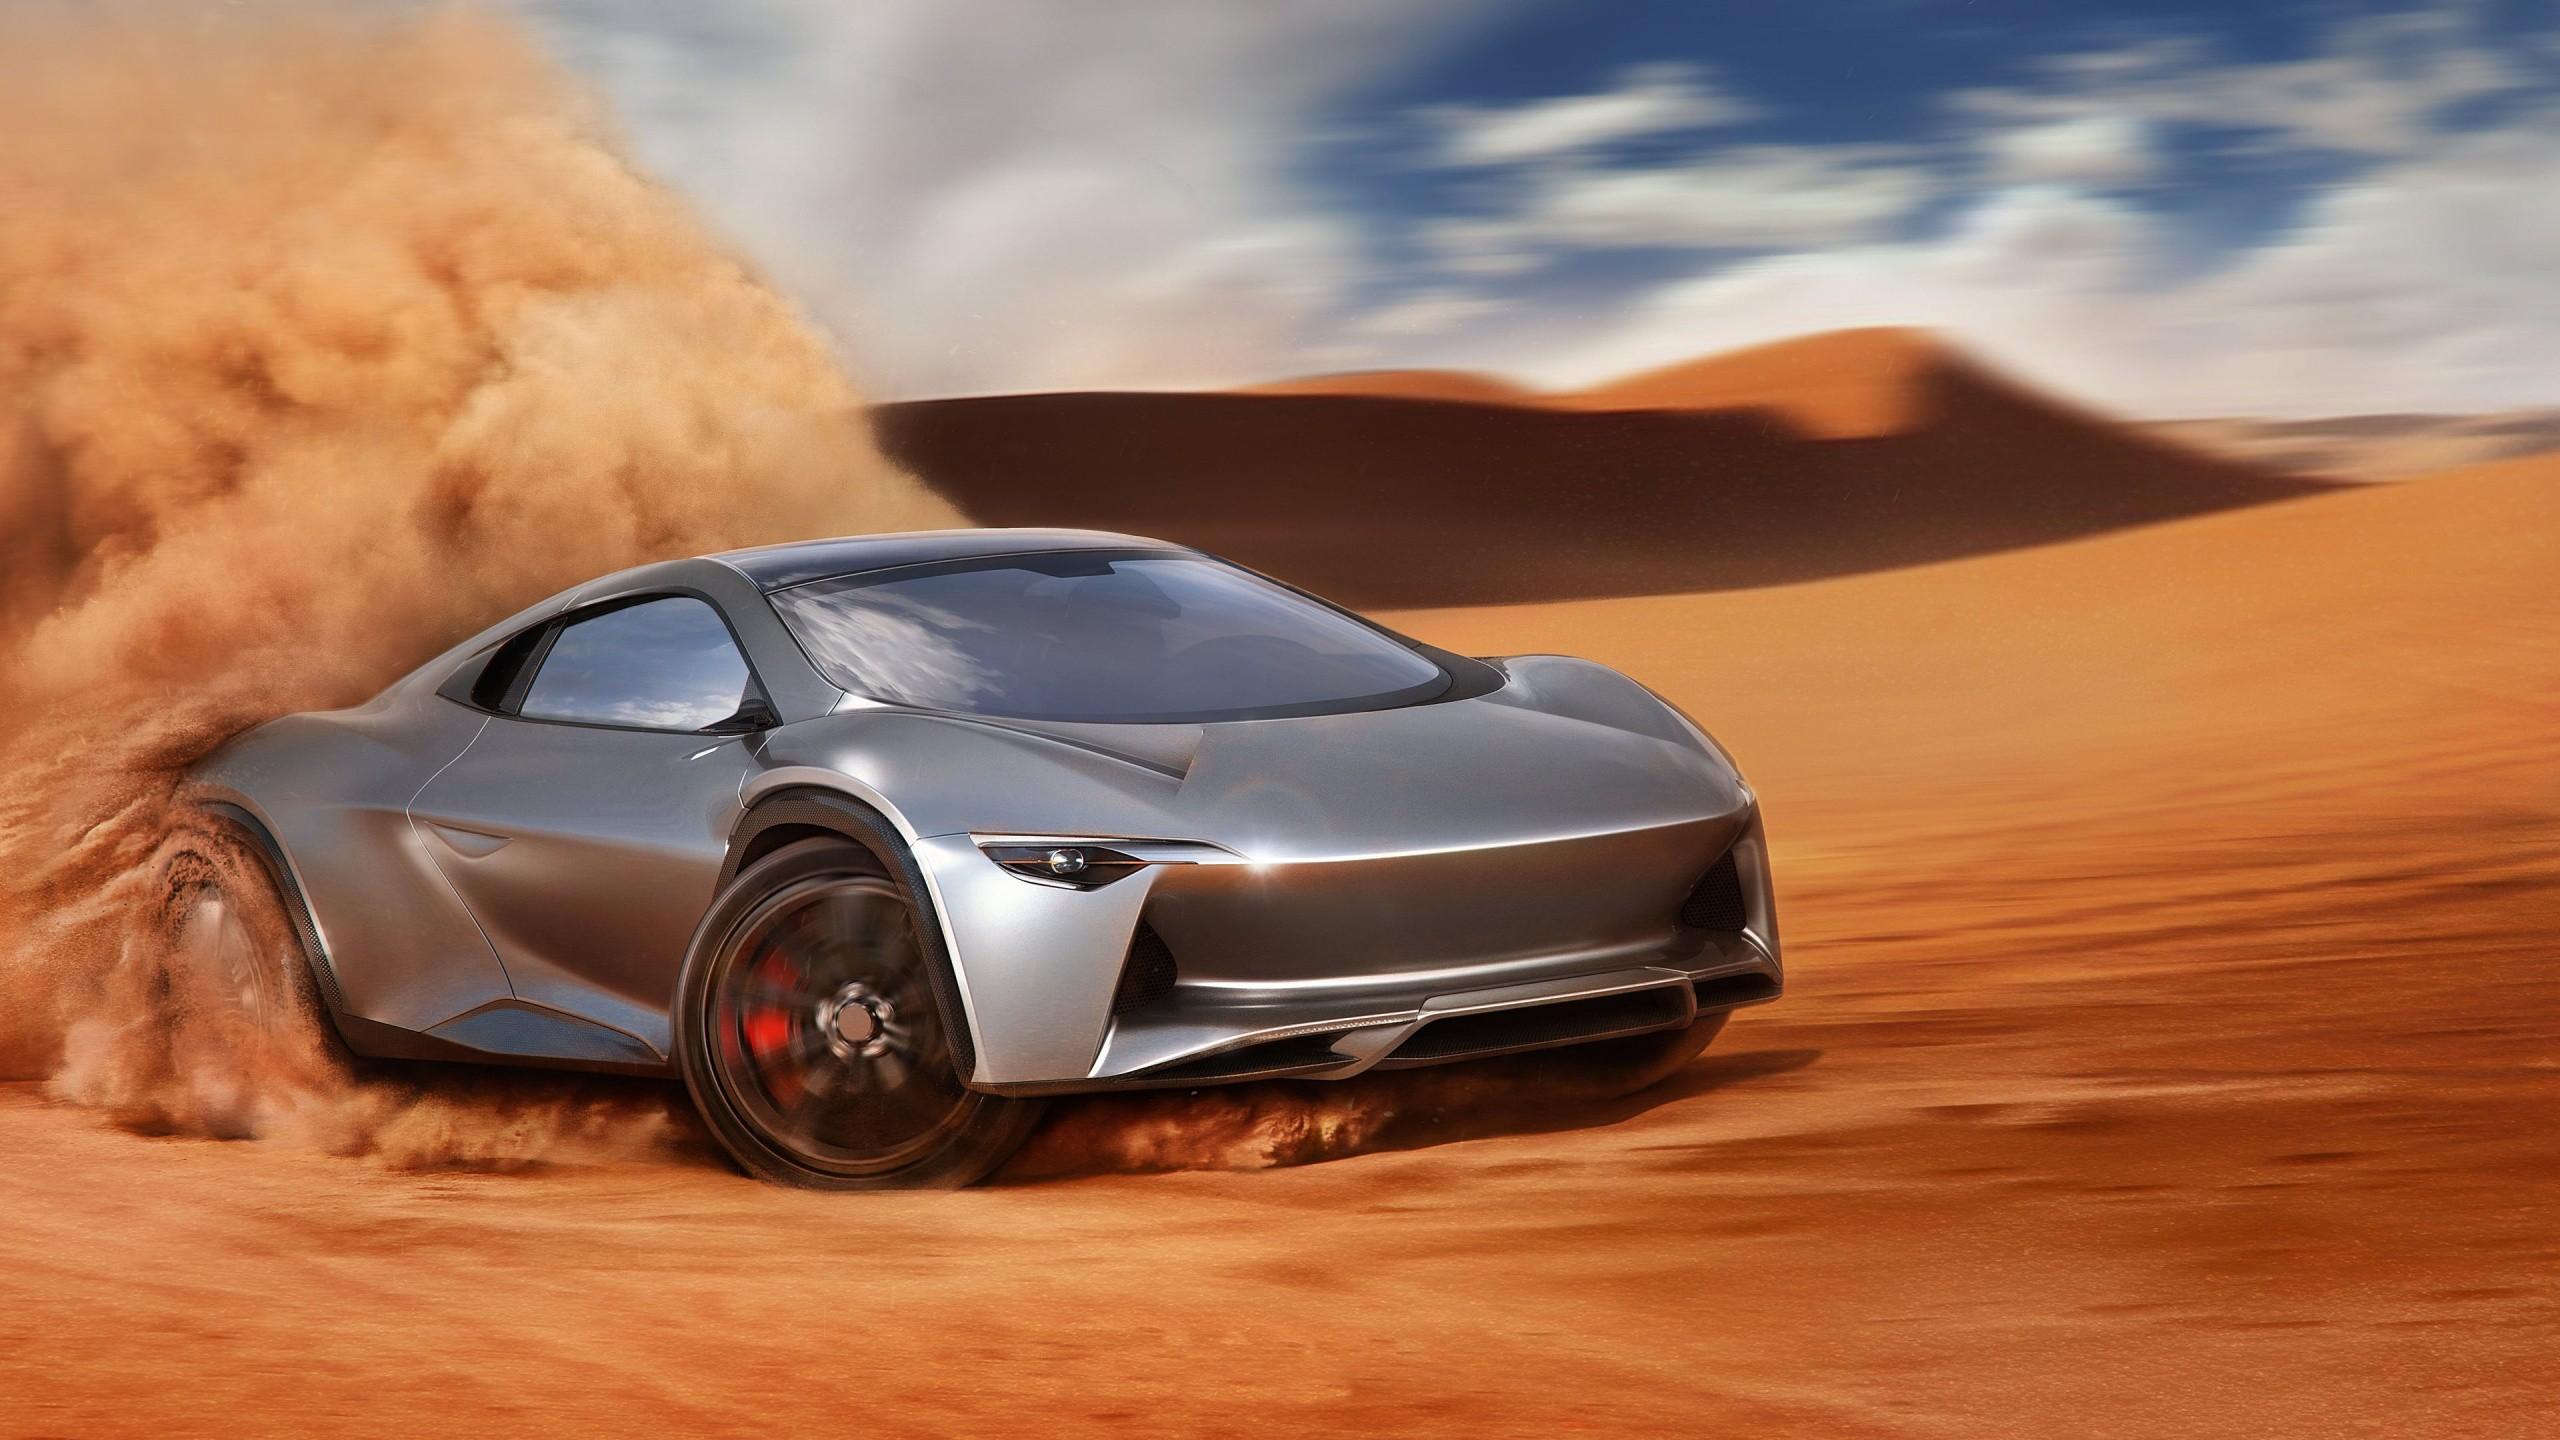 General 2560x1440 car supercars desert sand vehicle silver cars